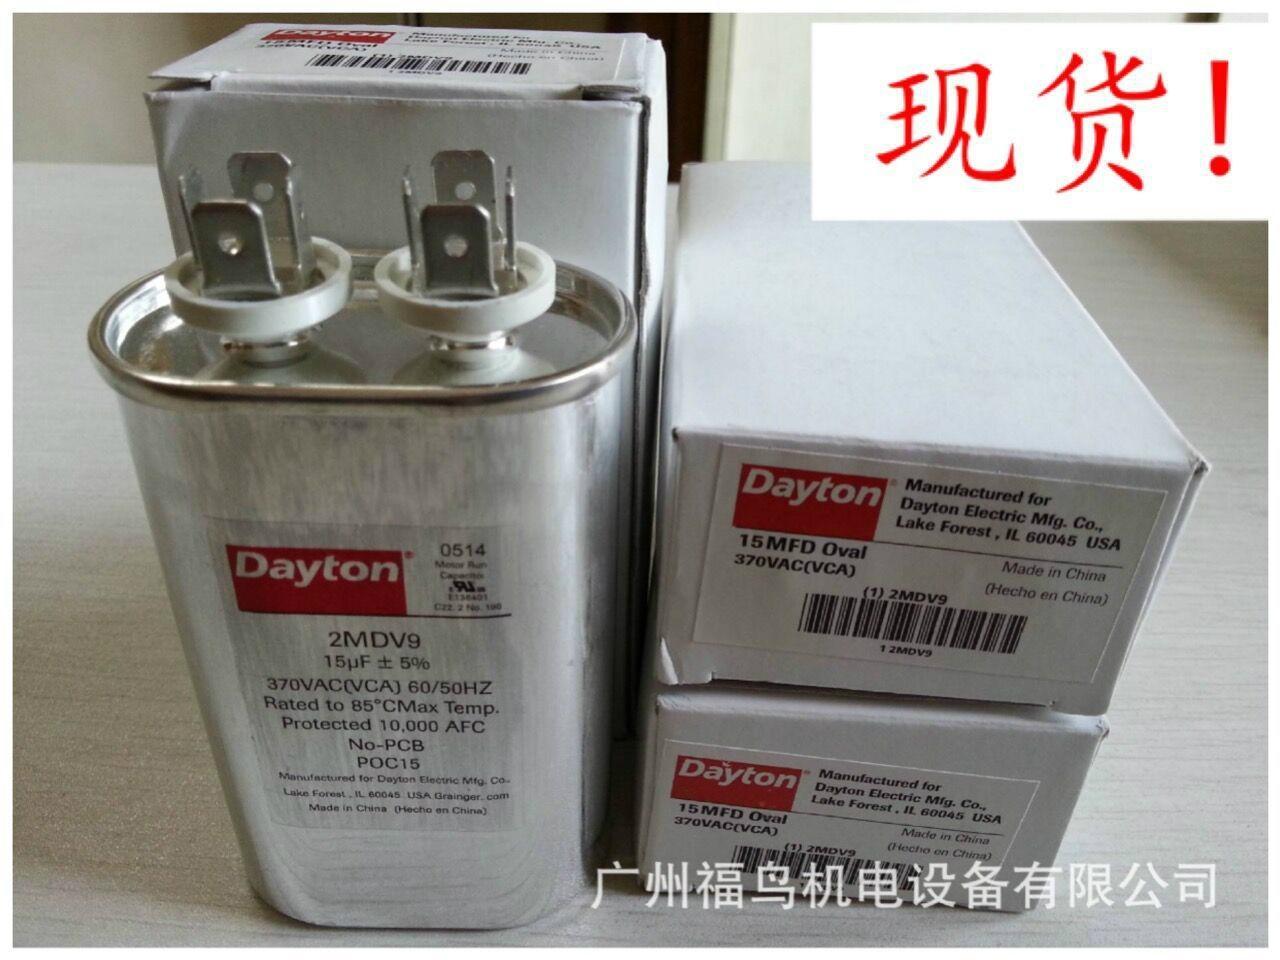 DAYTON电容  型号: 2MDV9